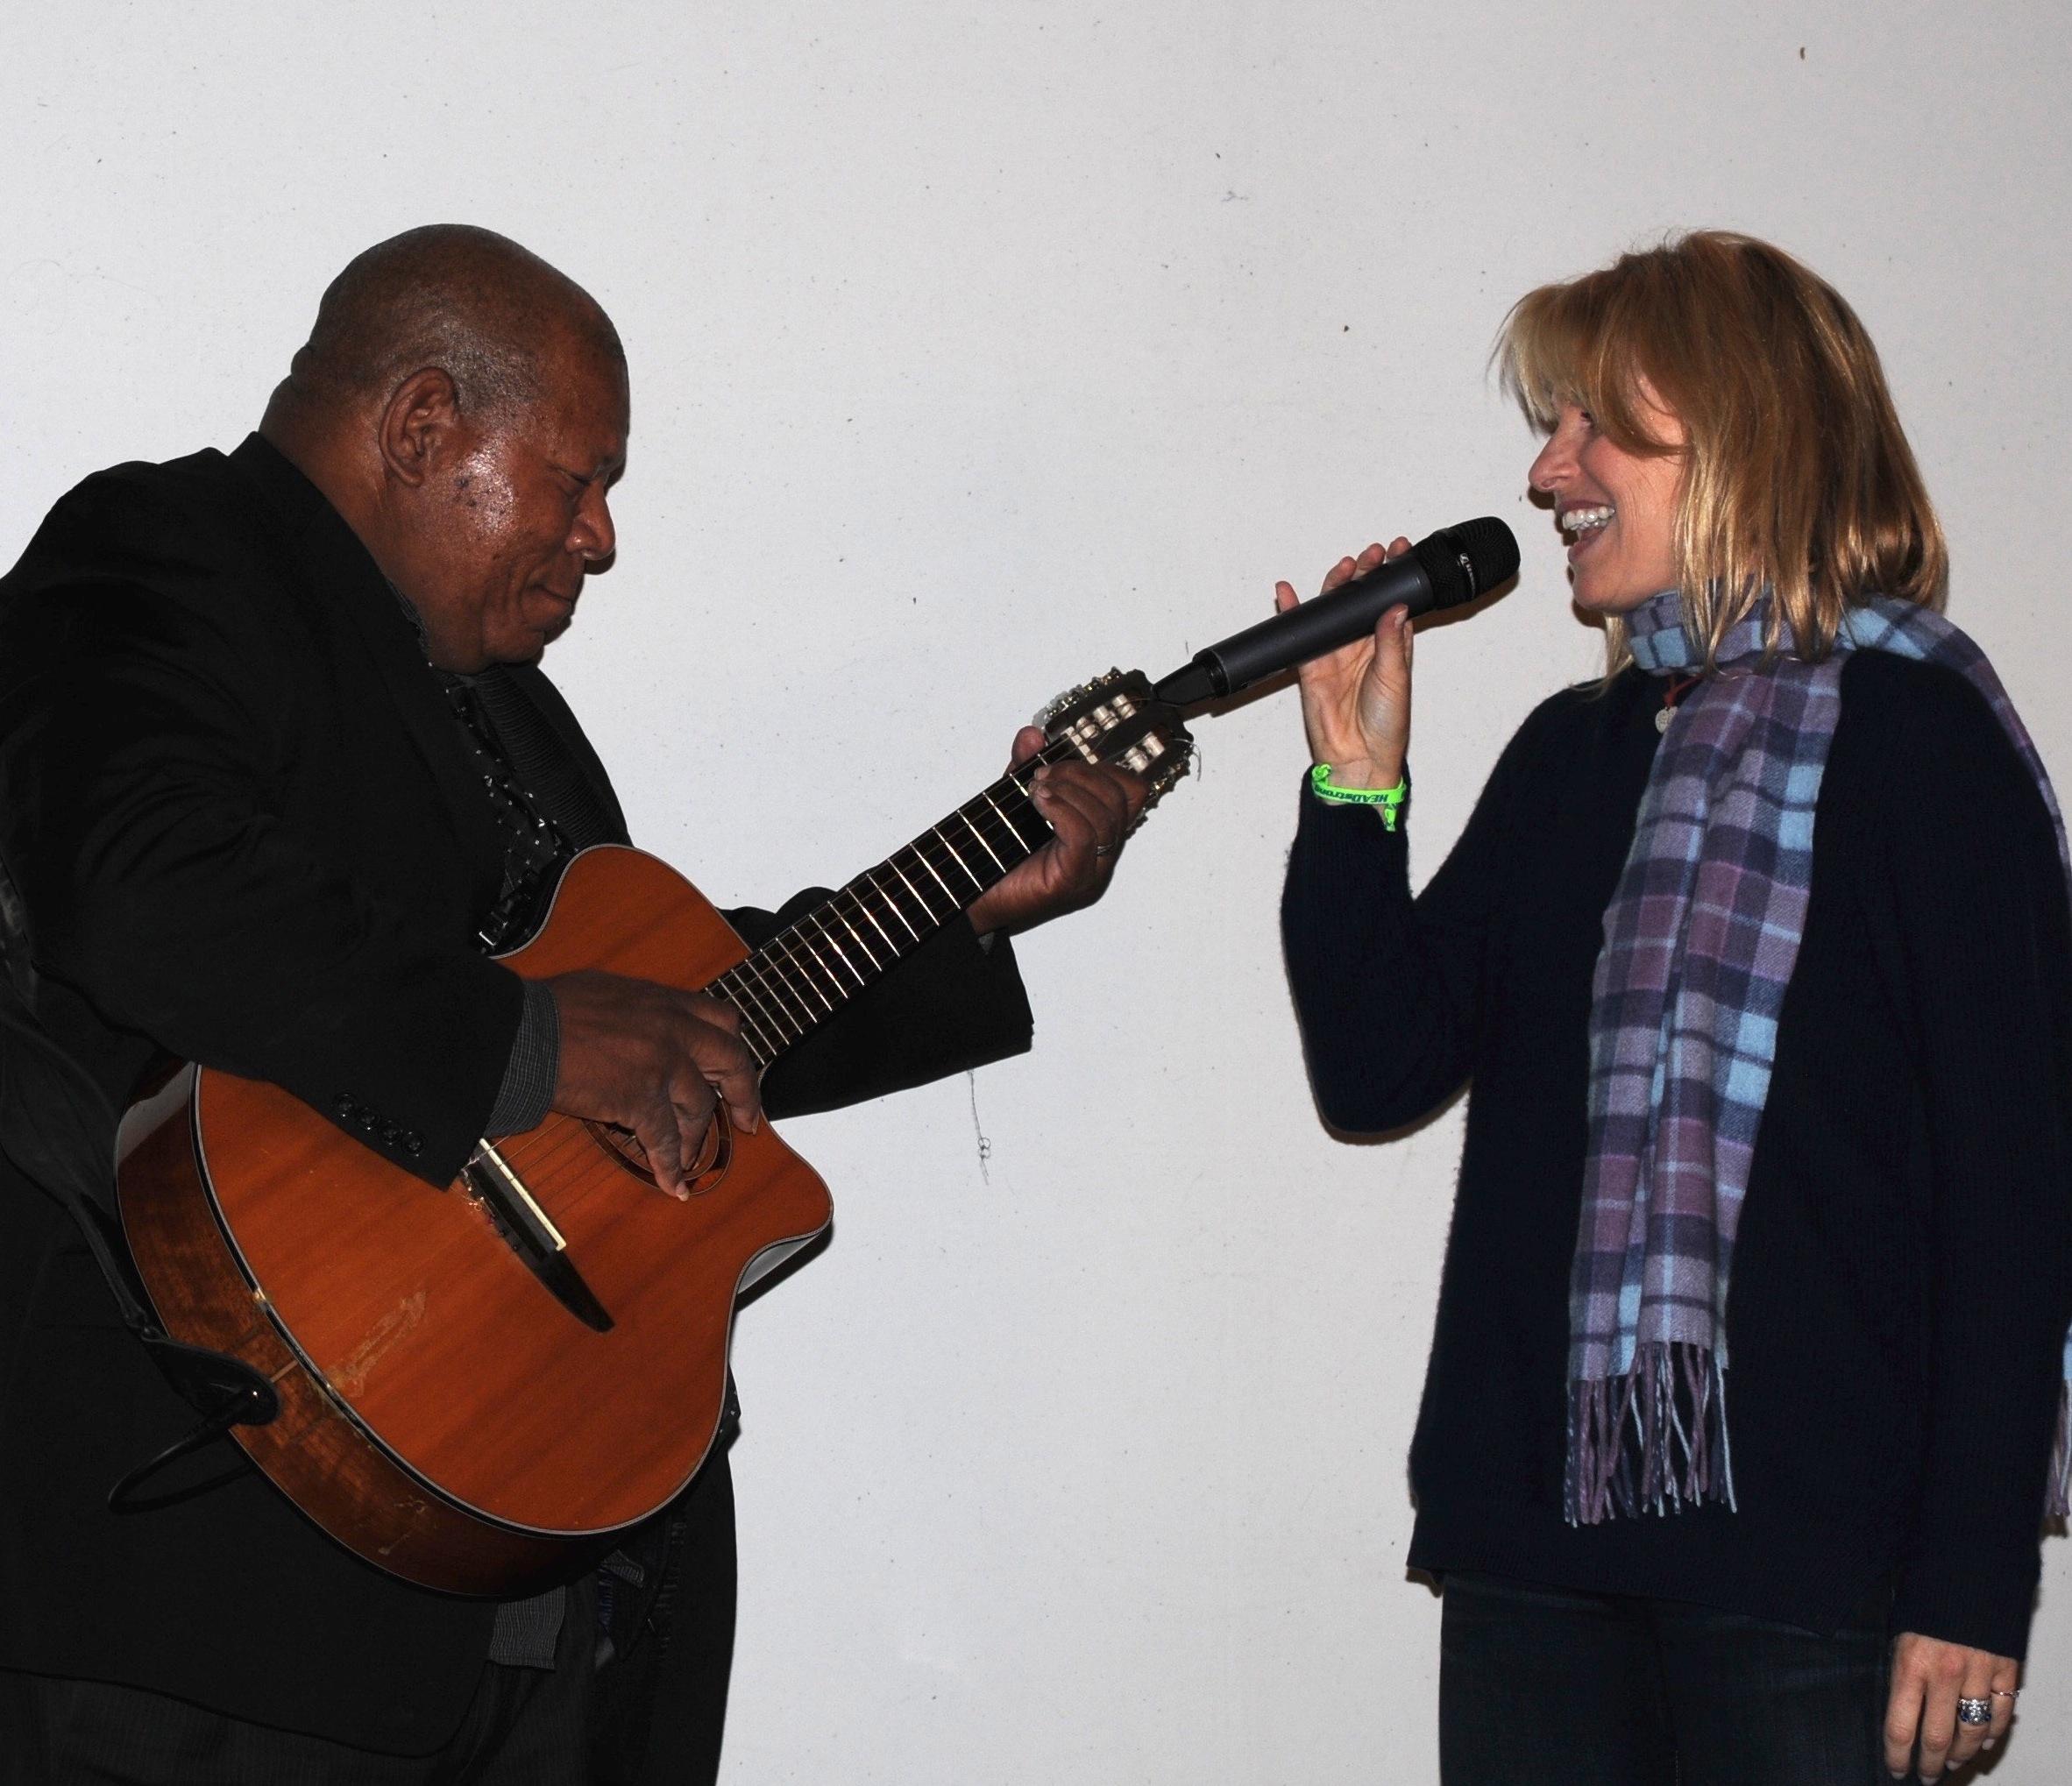 Flyers songstress Lauren Hart, an ECHOES Advisory Board member, joins Haitian guitarist Moe Cadet on stage.